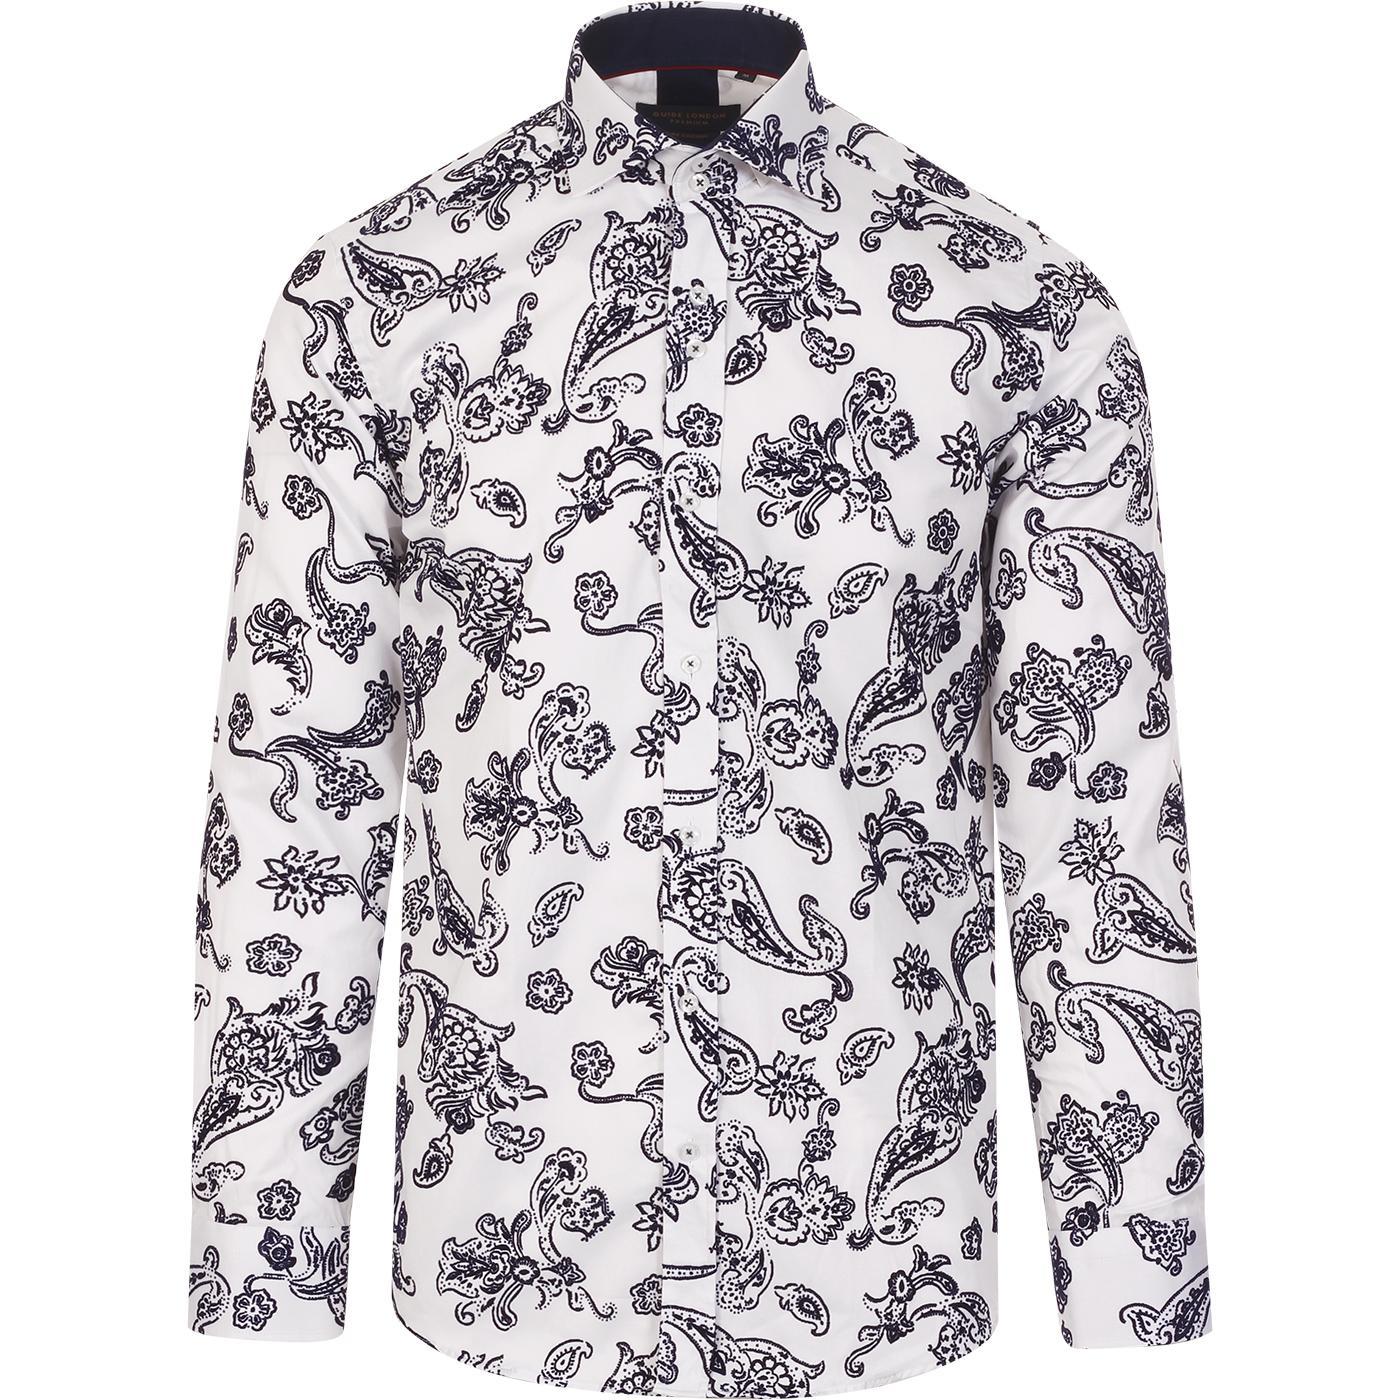 GUIDE LONDON Retro Flock Floral Paisley Shirt (W)